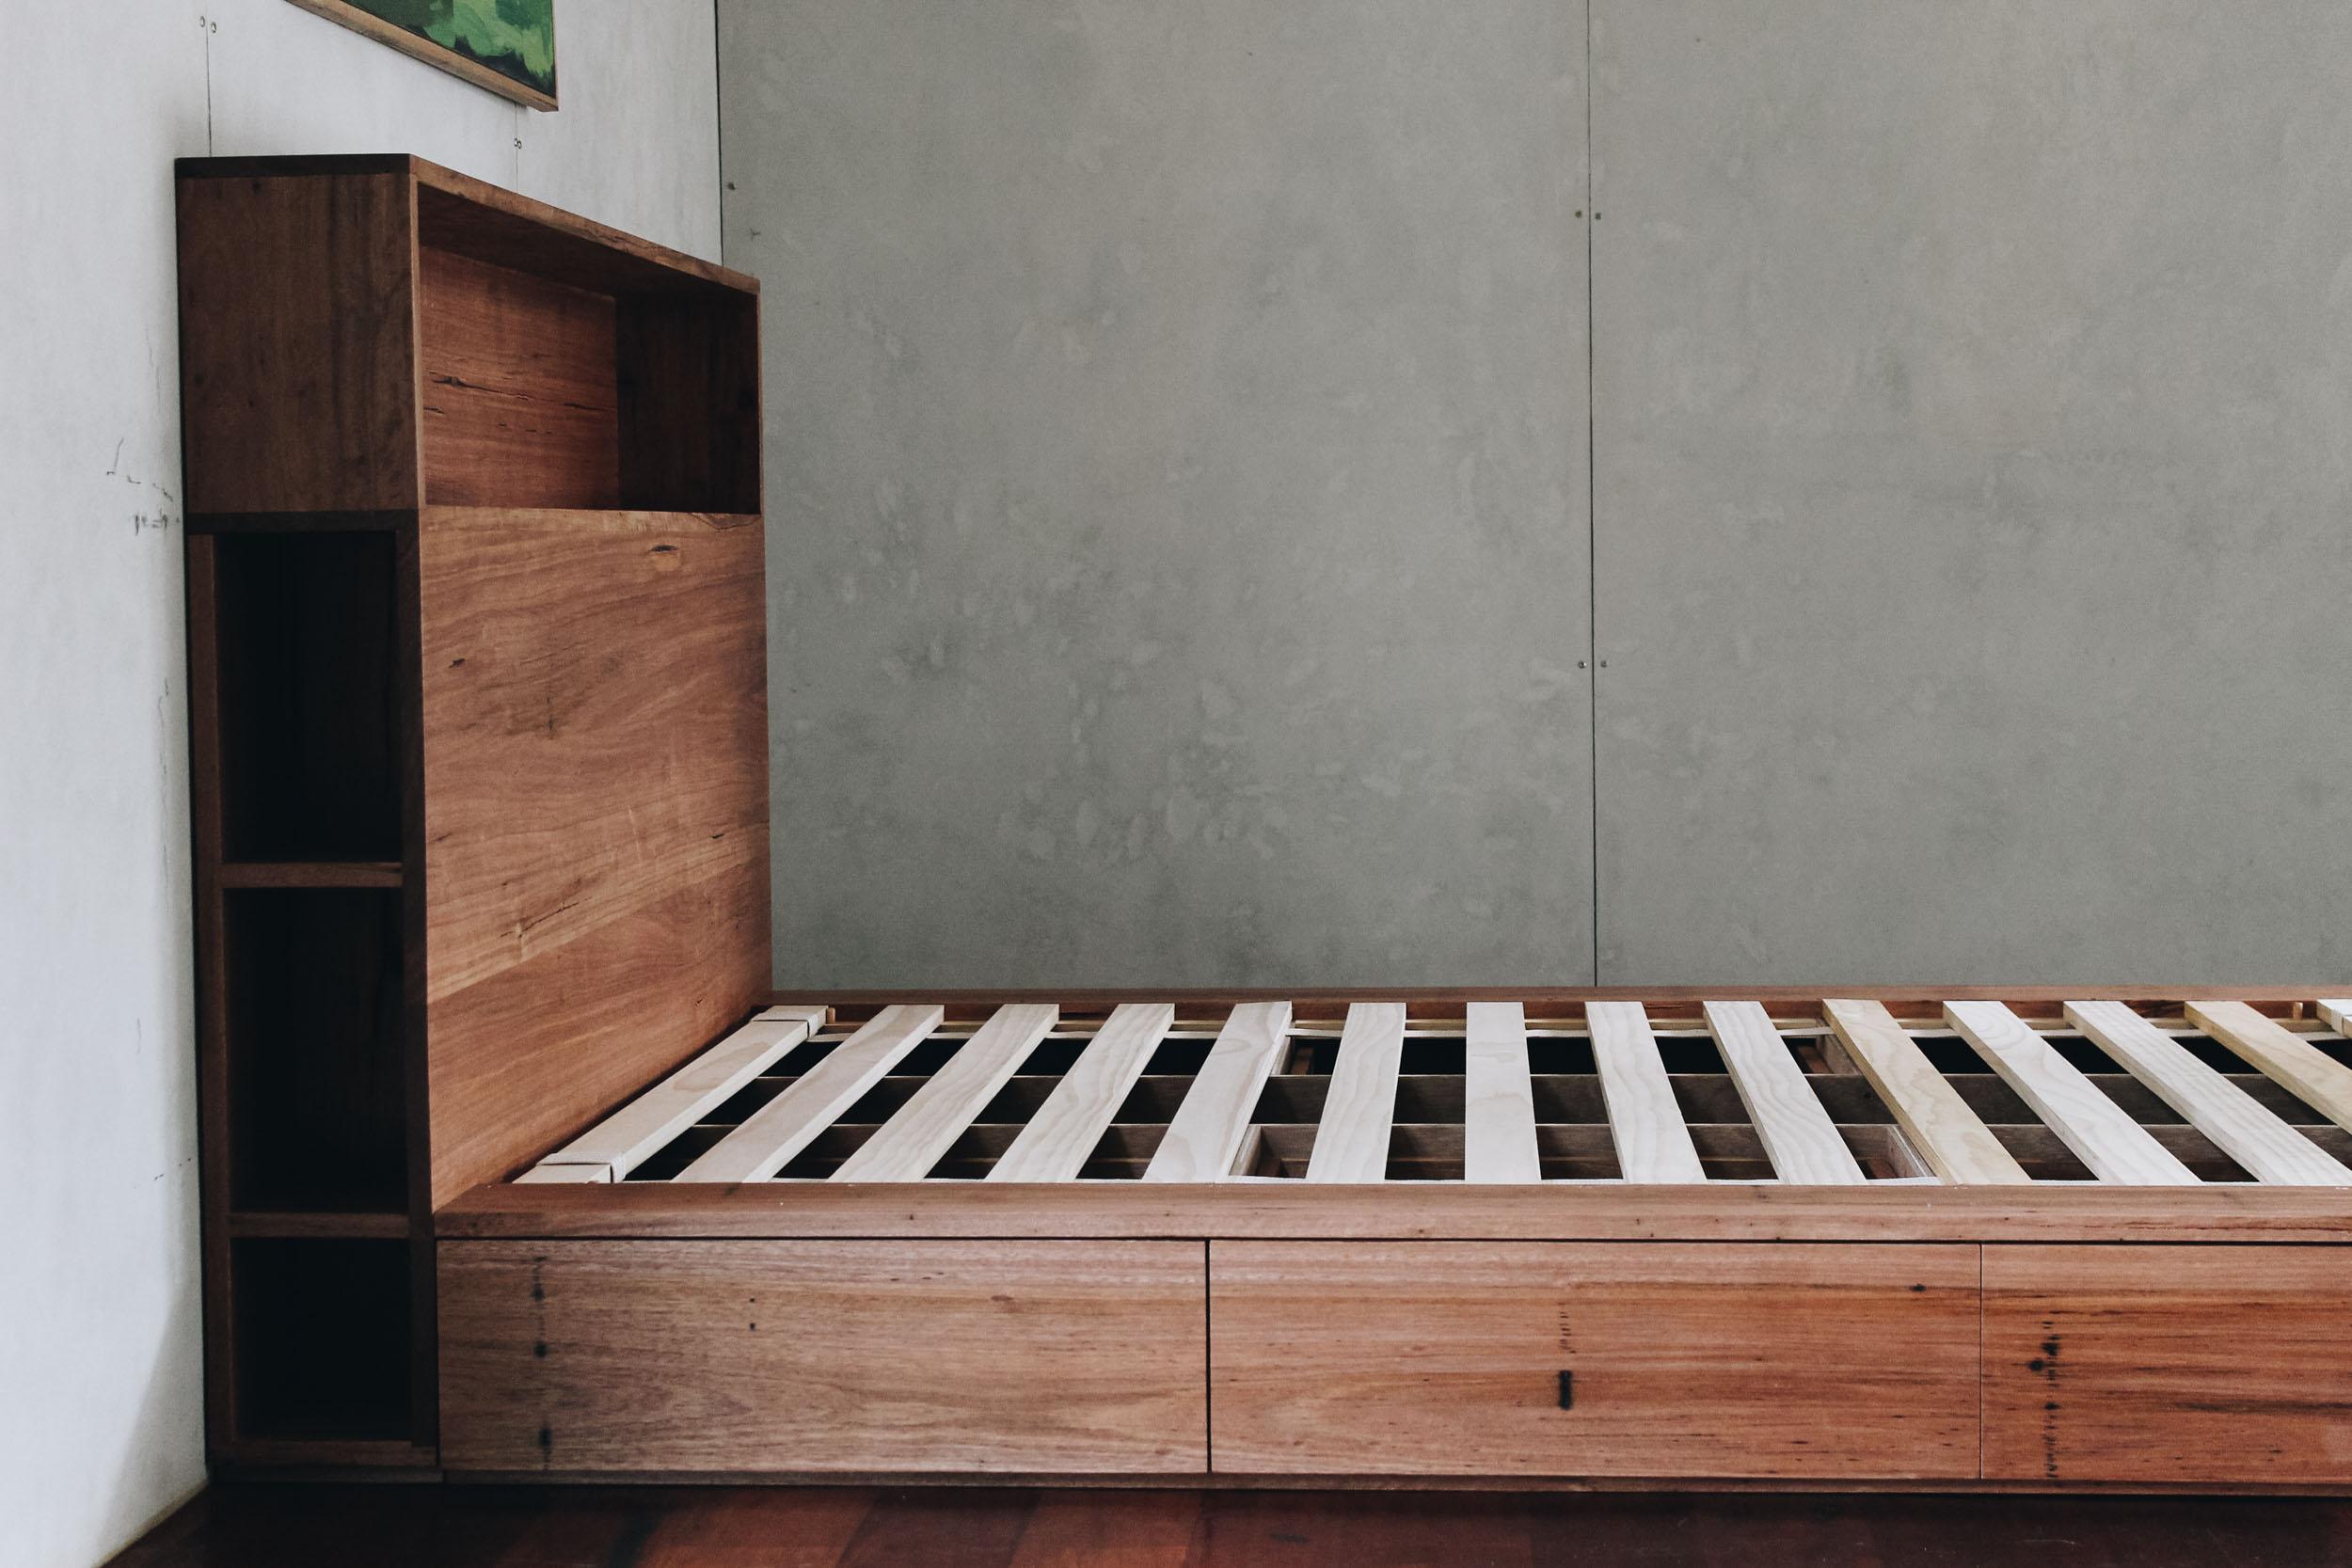 Al and Imo Handmade Bookshelf Drawer Bed Recycled timber - surf coast - melbourne - australia-31.jpg